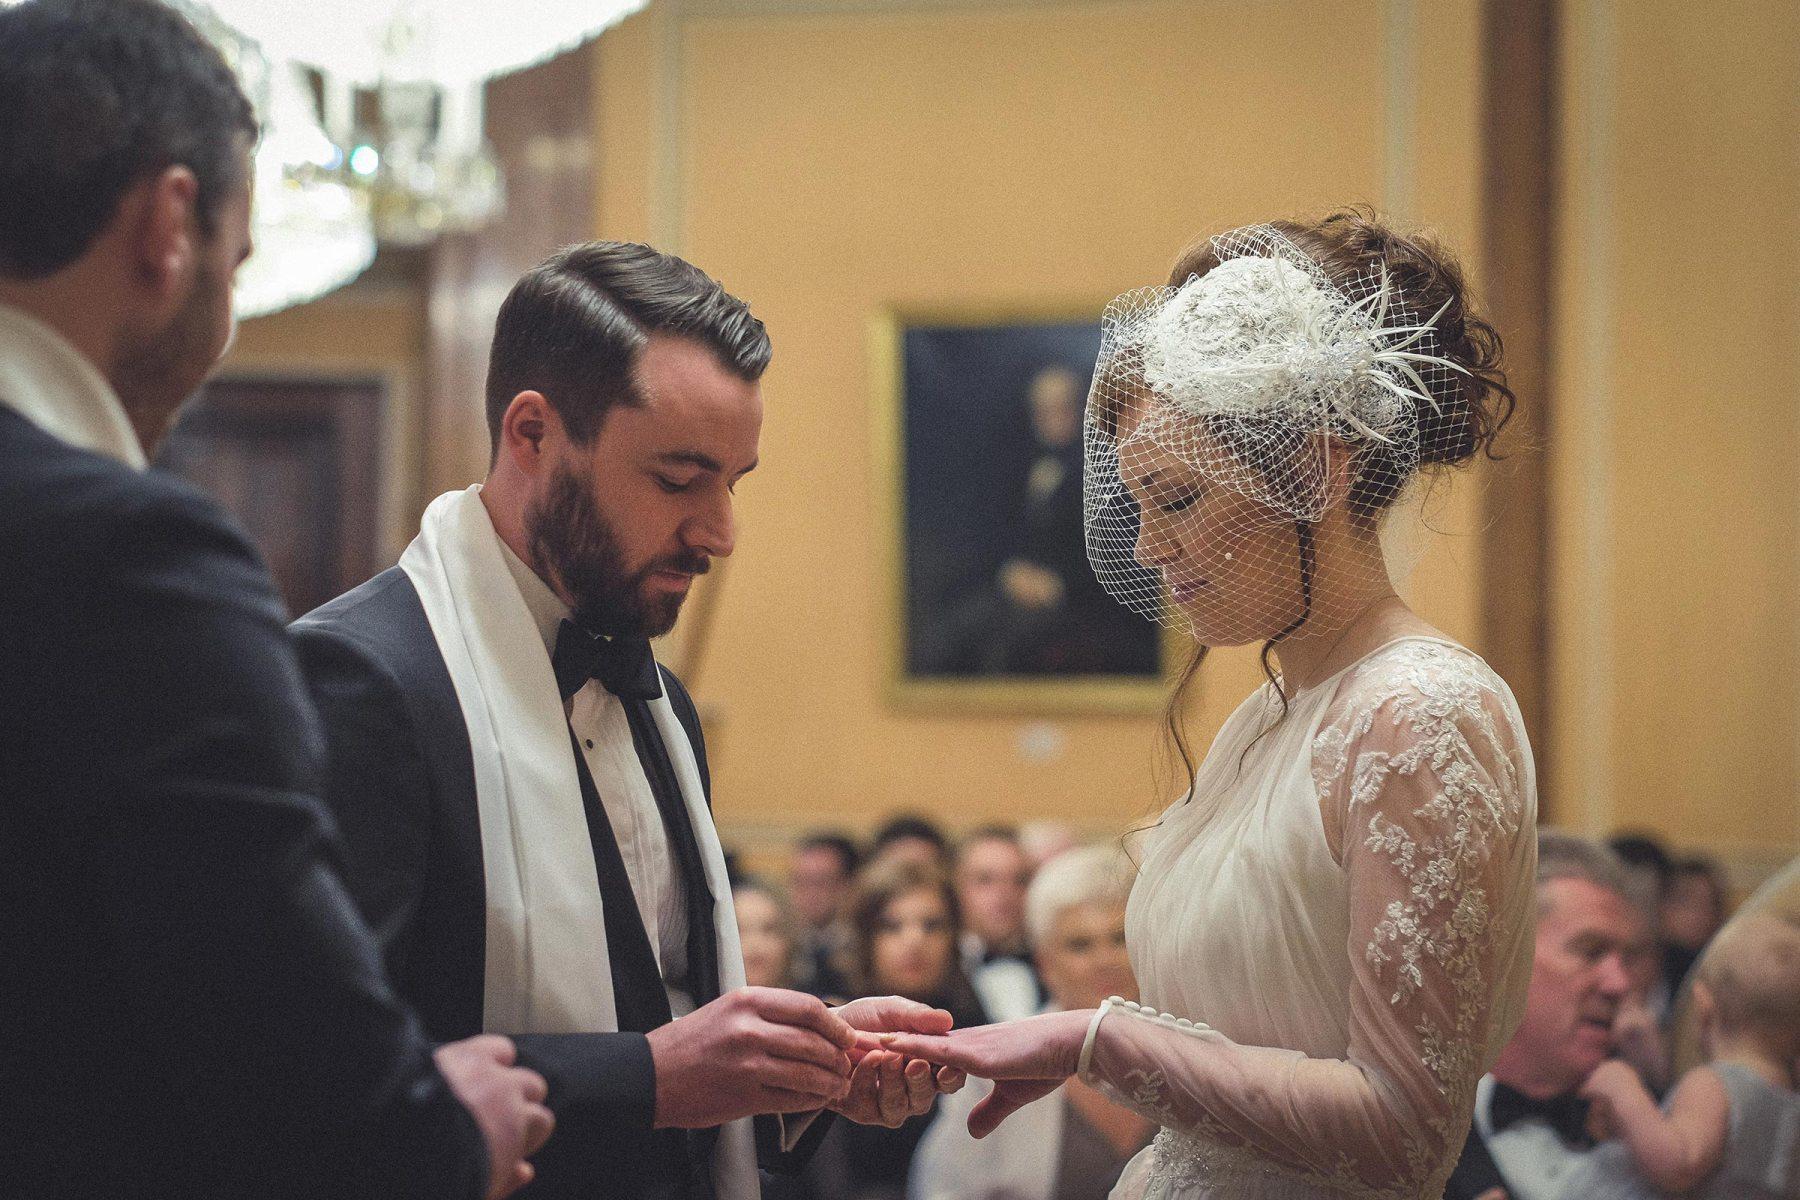 Cheshire Wedding Film - Bride & Groom